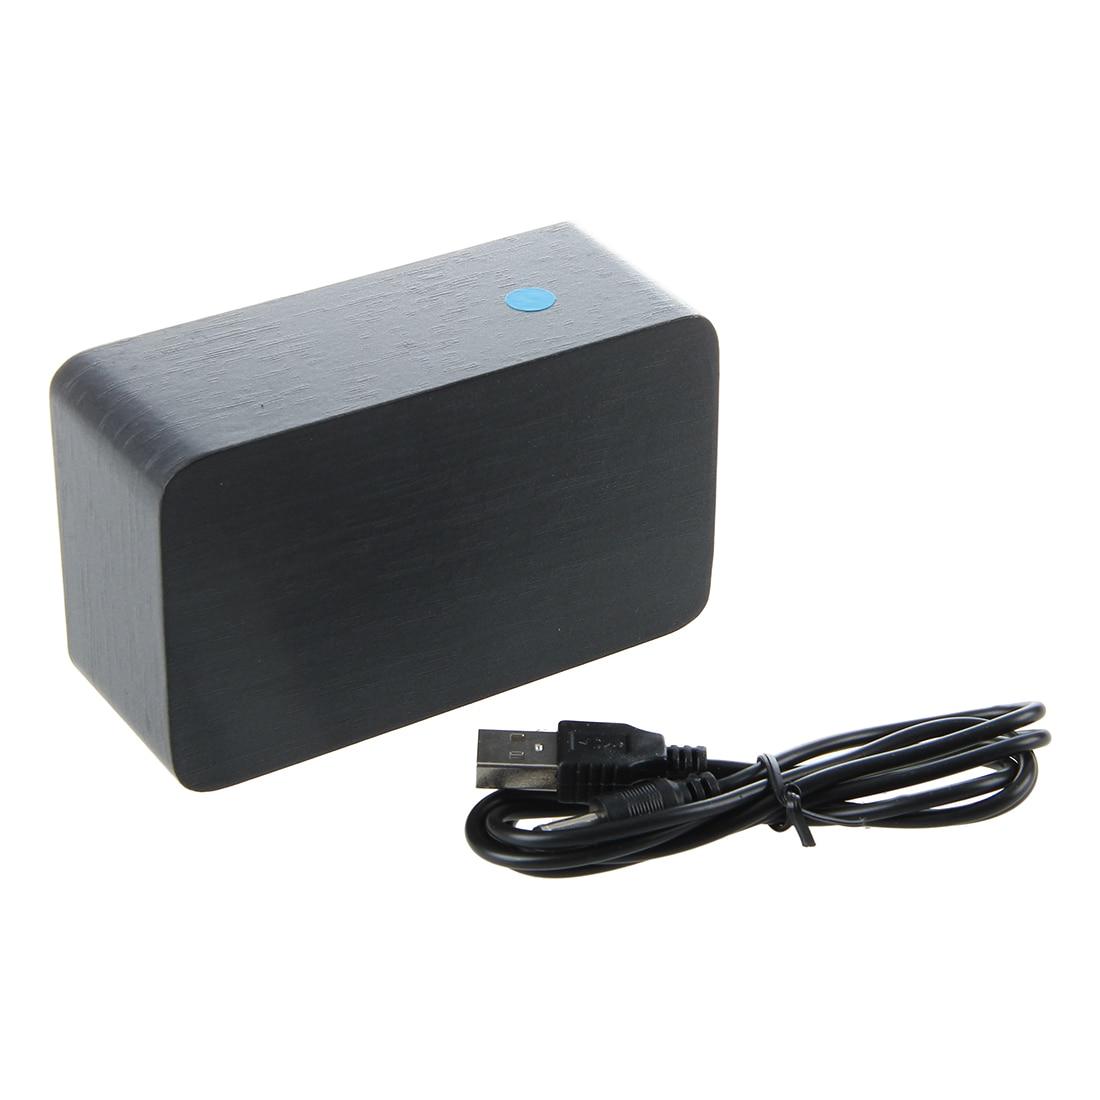 Display ALARM CLOCK MORNING ASK WOOD cube LED DIGITAL WATCH ALARM CLOCK BLACK Clocks